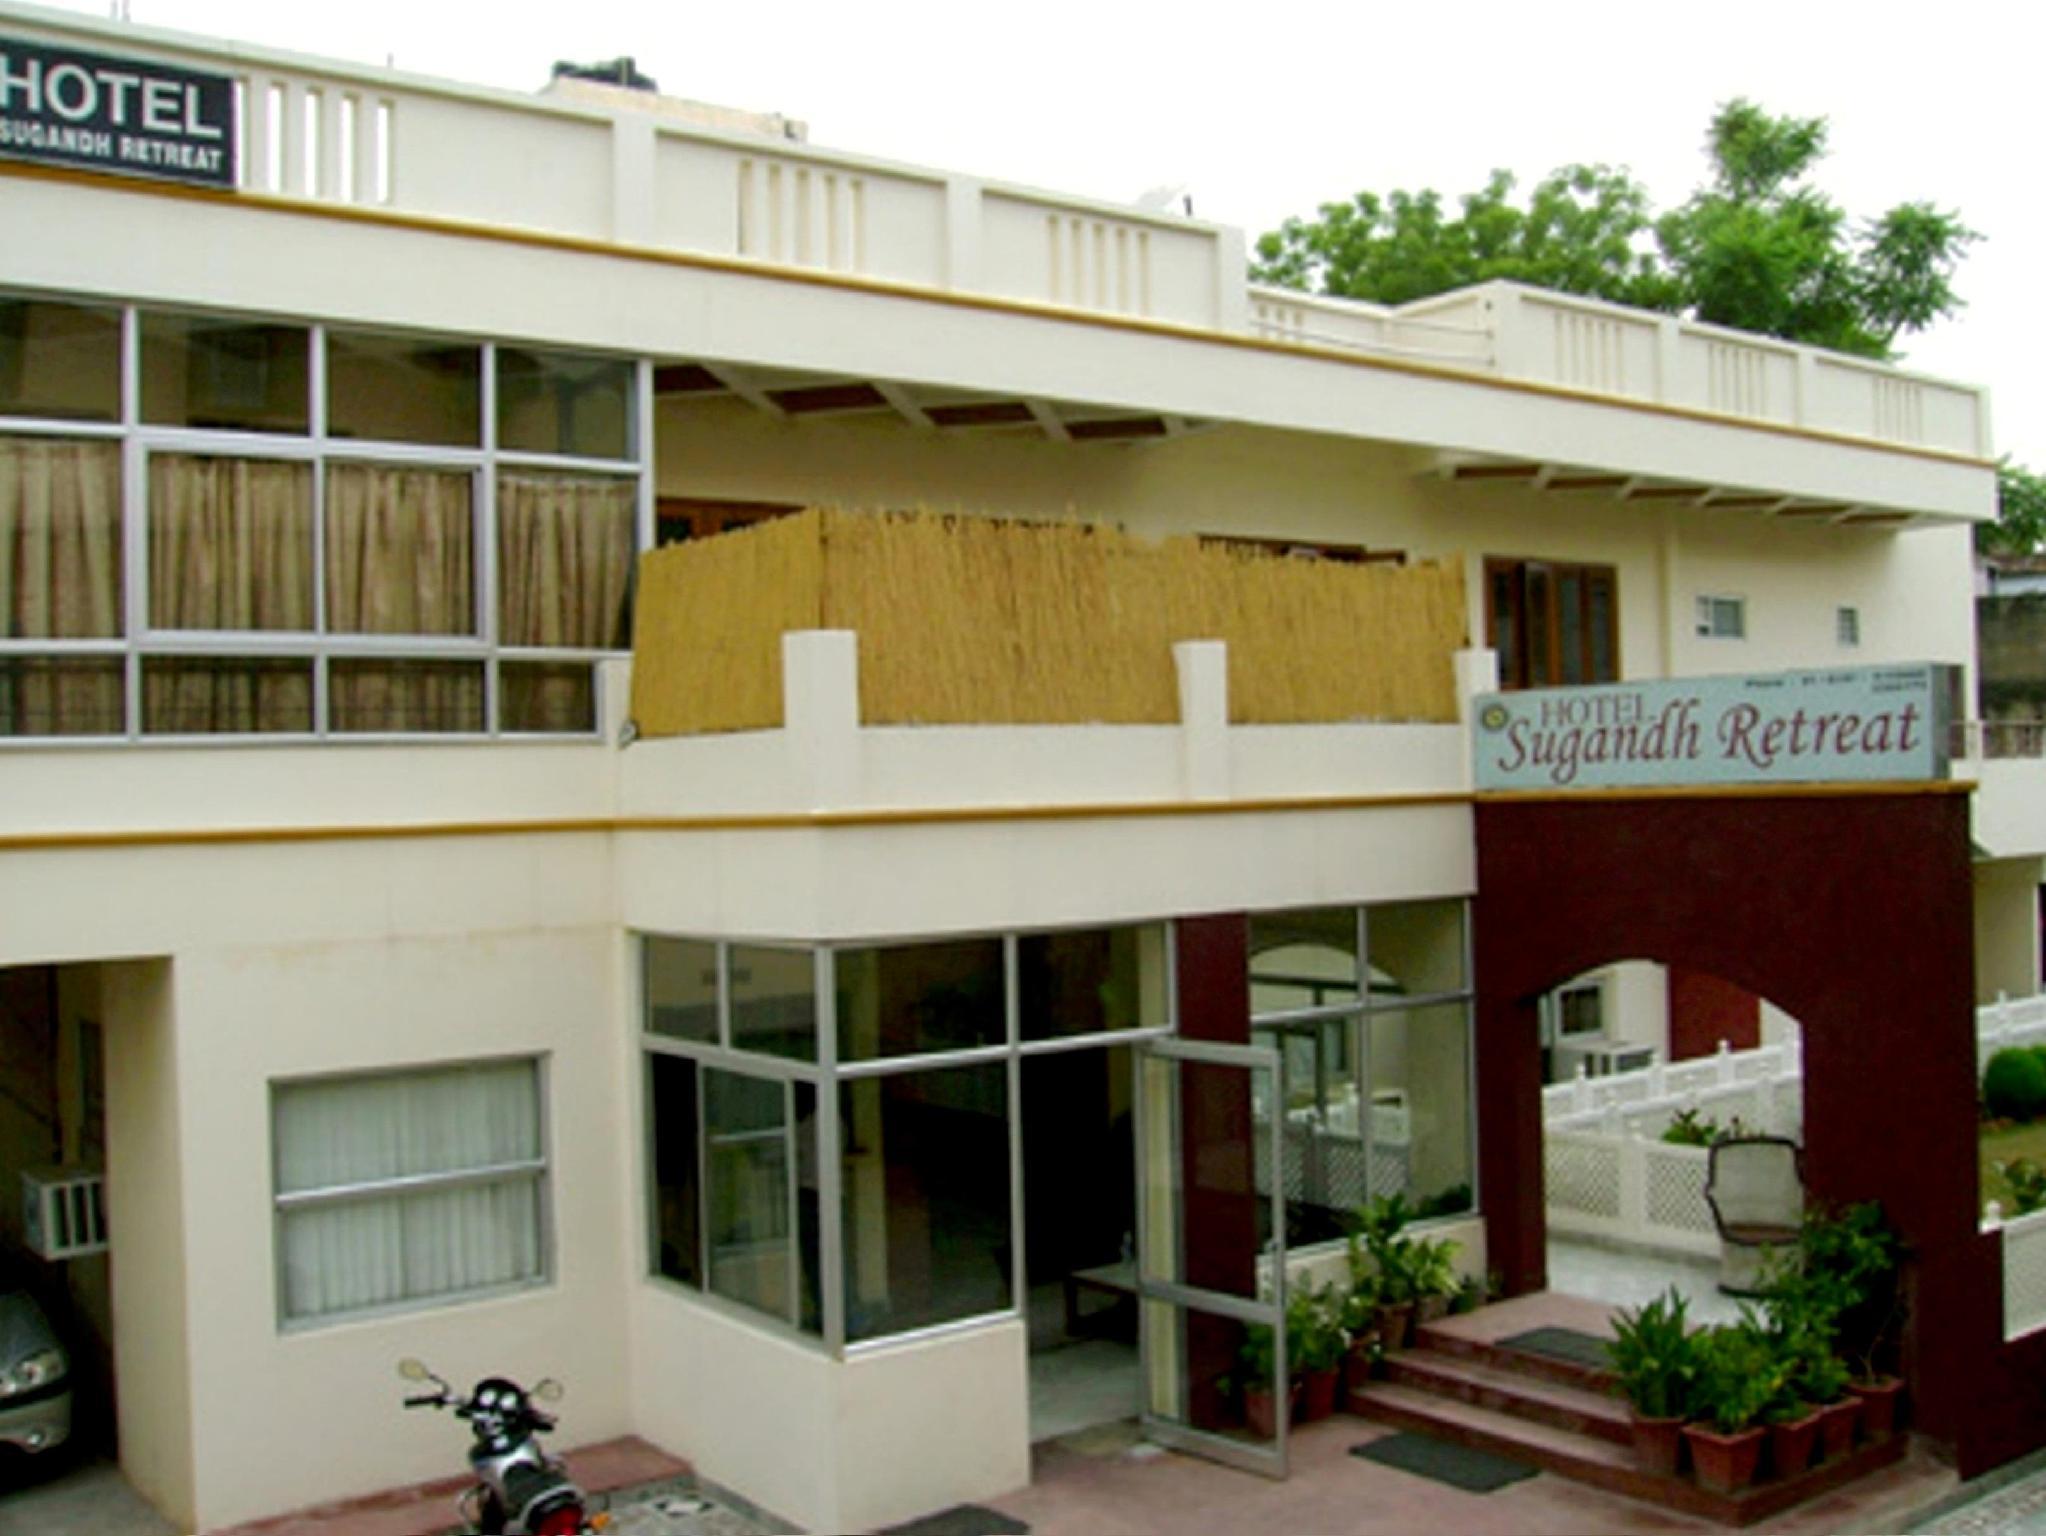 Hotel Sugandh Retreat Reviews